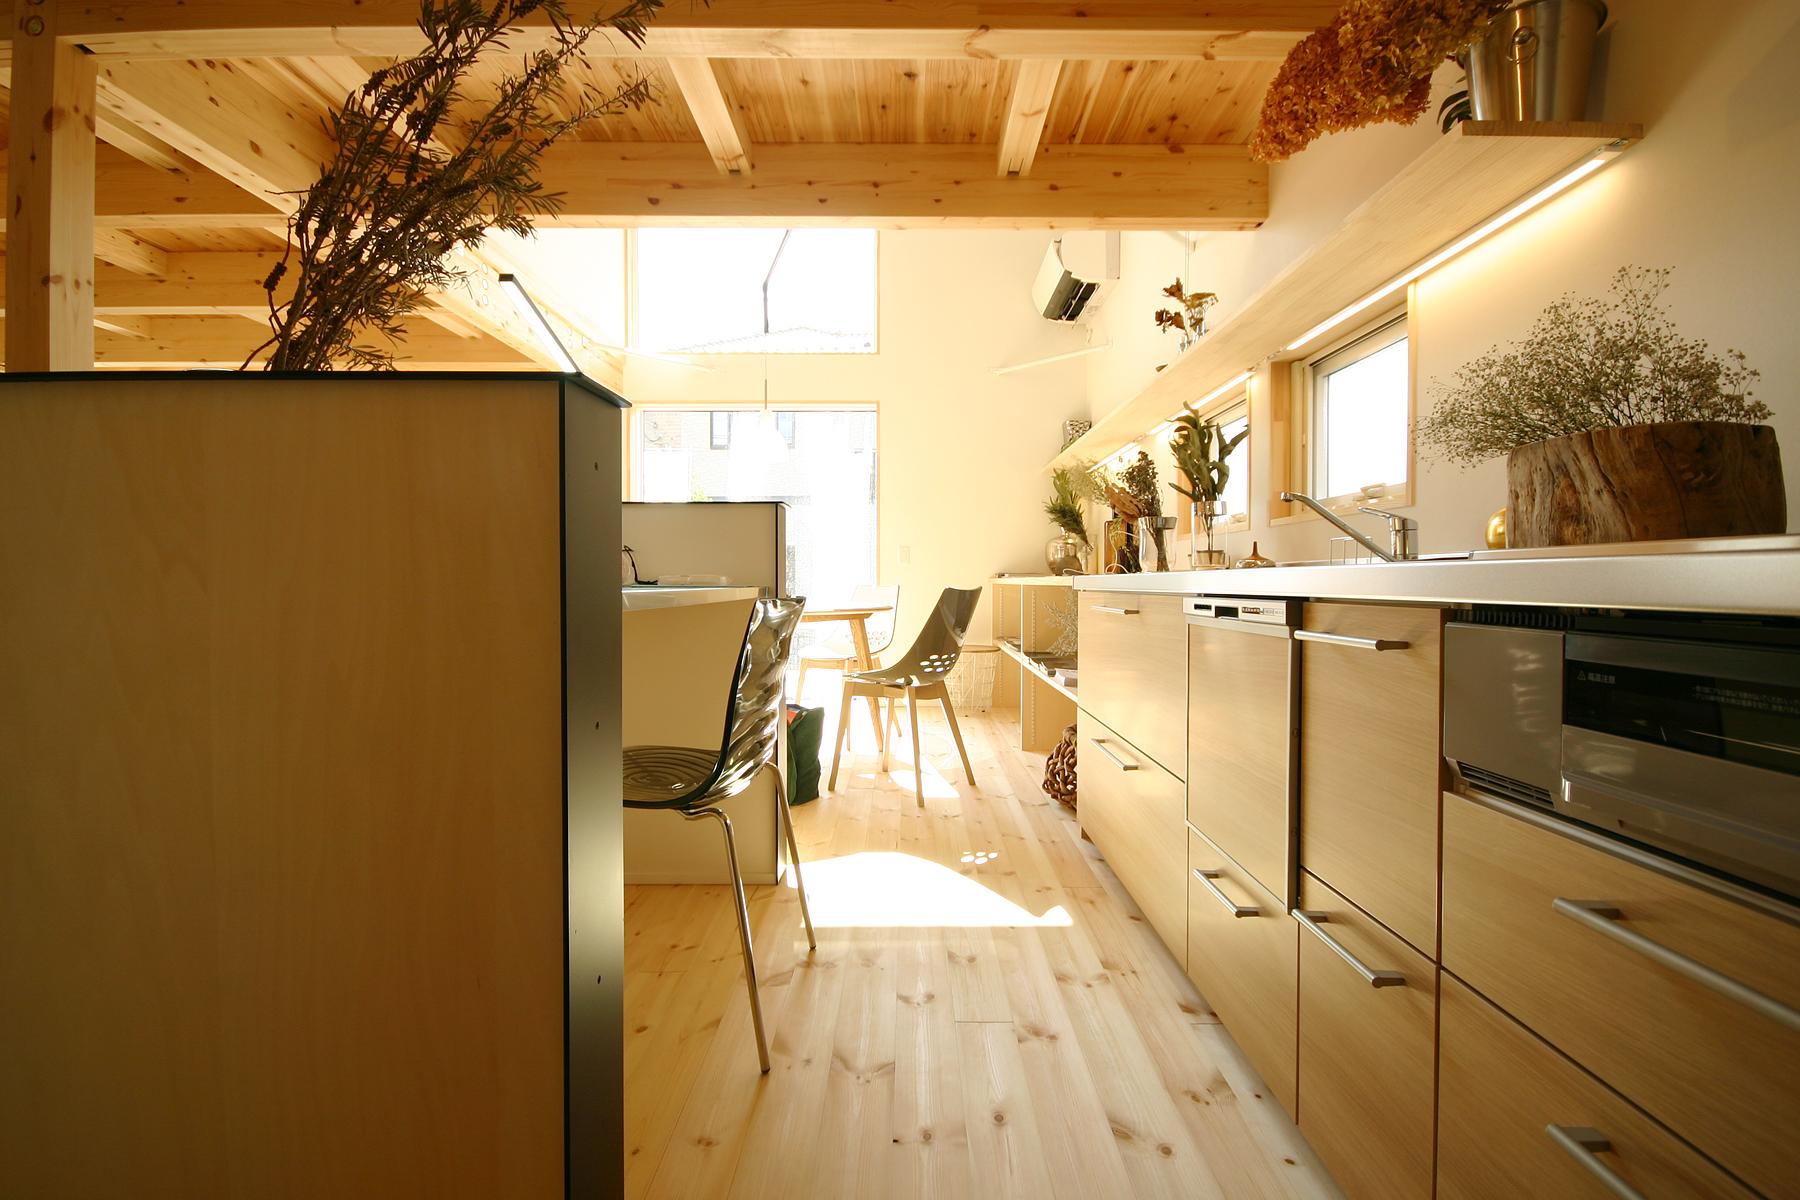 BEAHAUS|N-SERIES キッチン|栃木県宇都宮市の注文住宅 ネクストハウスデザインの施工例